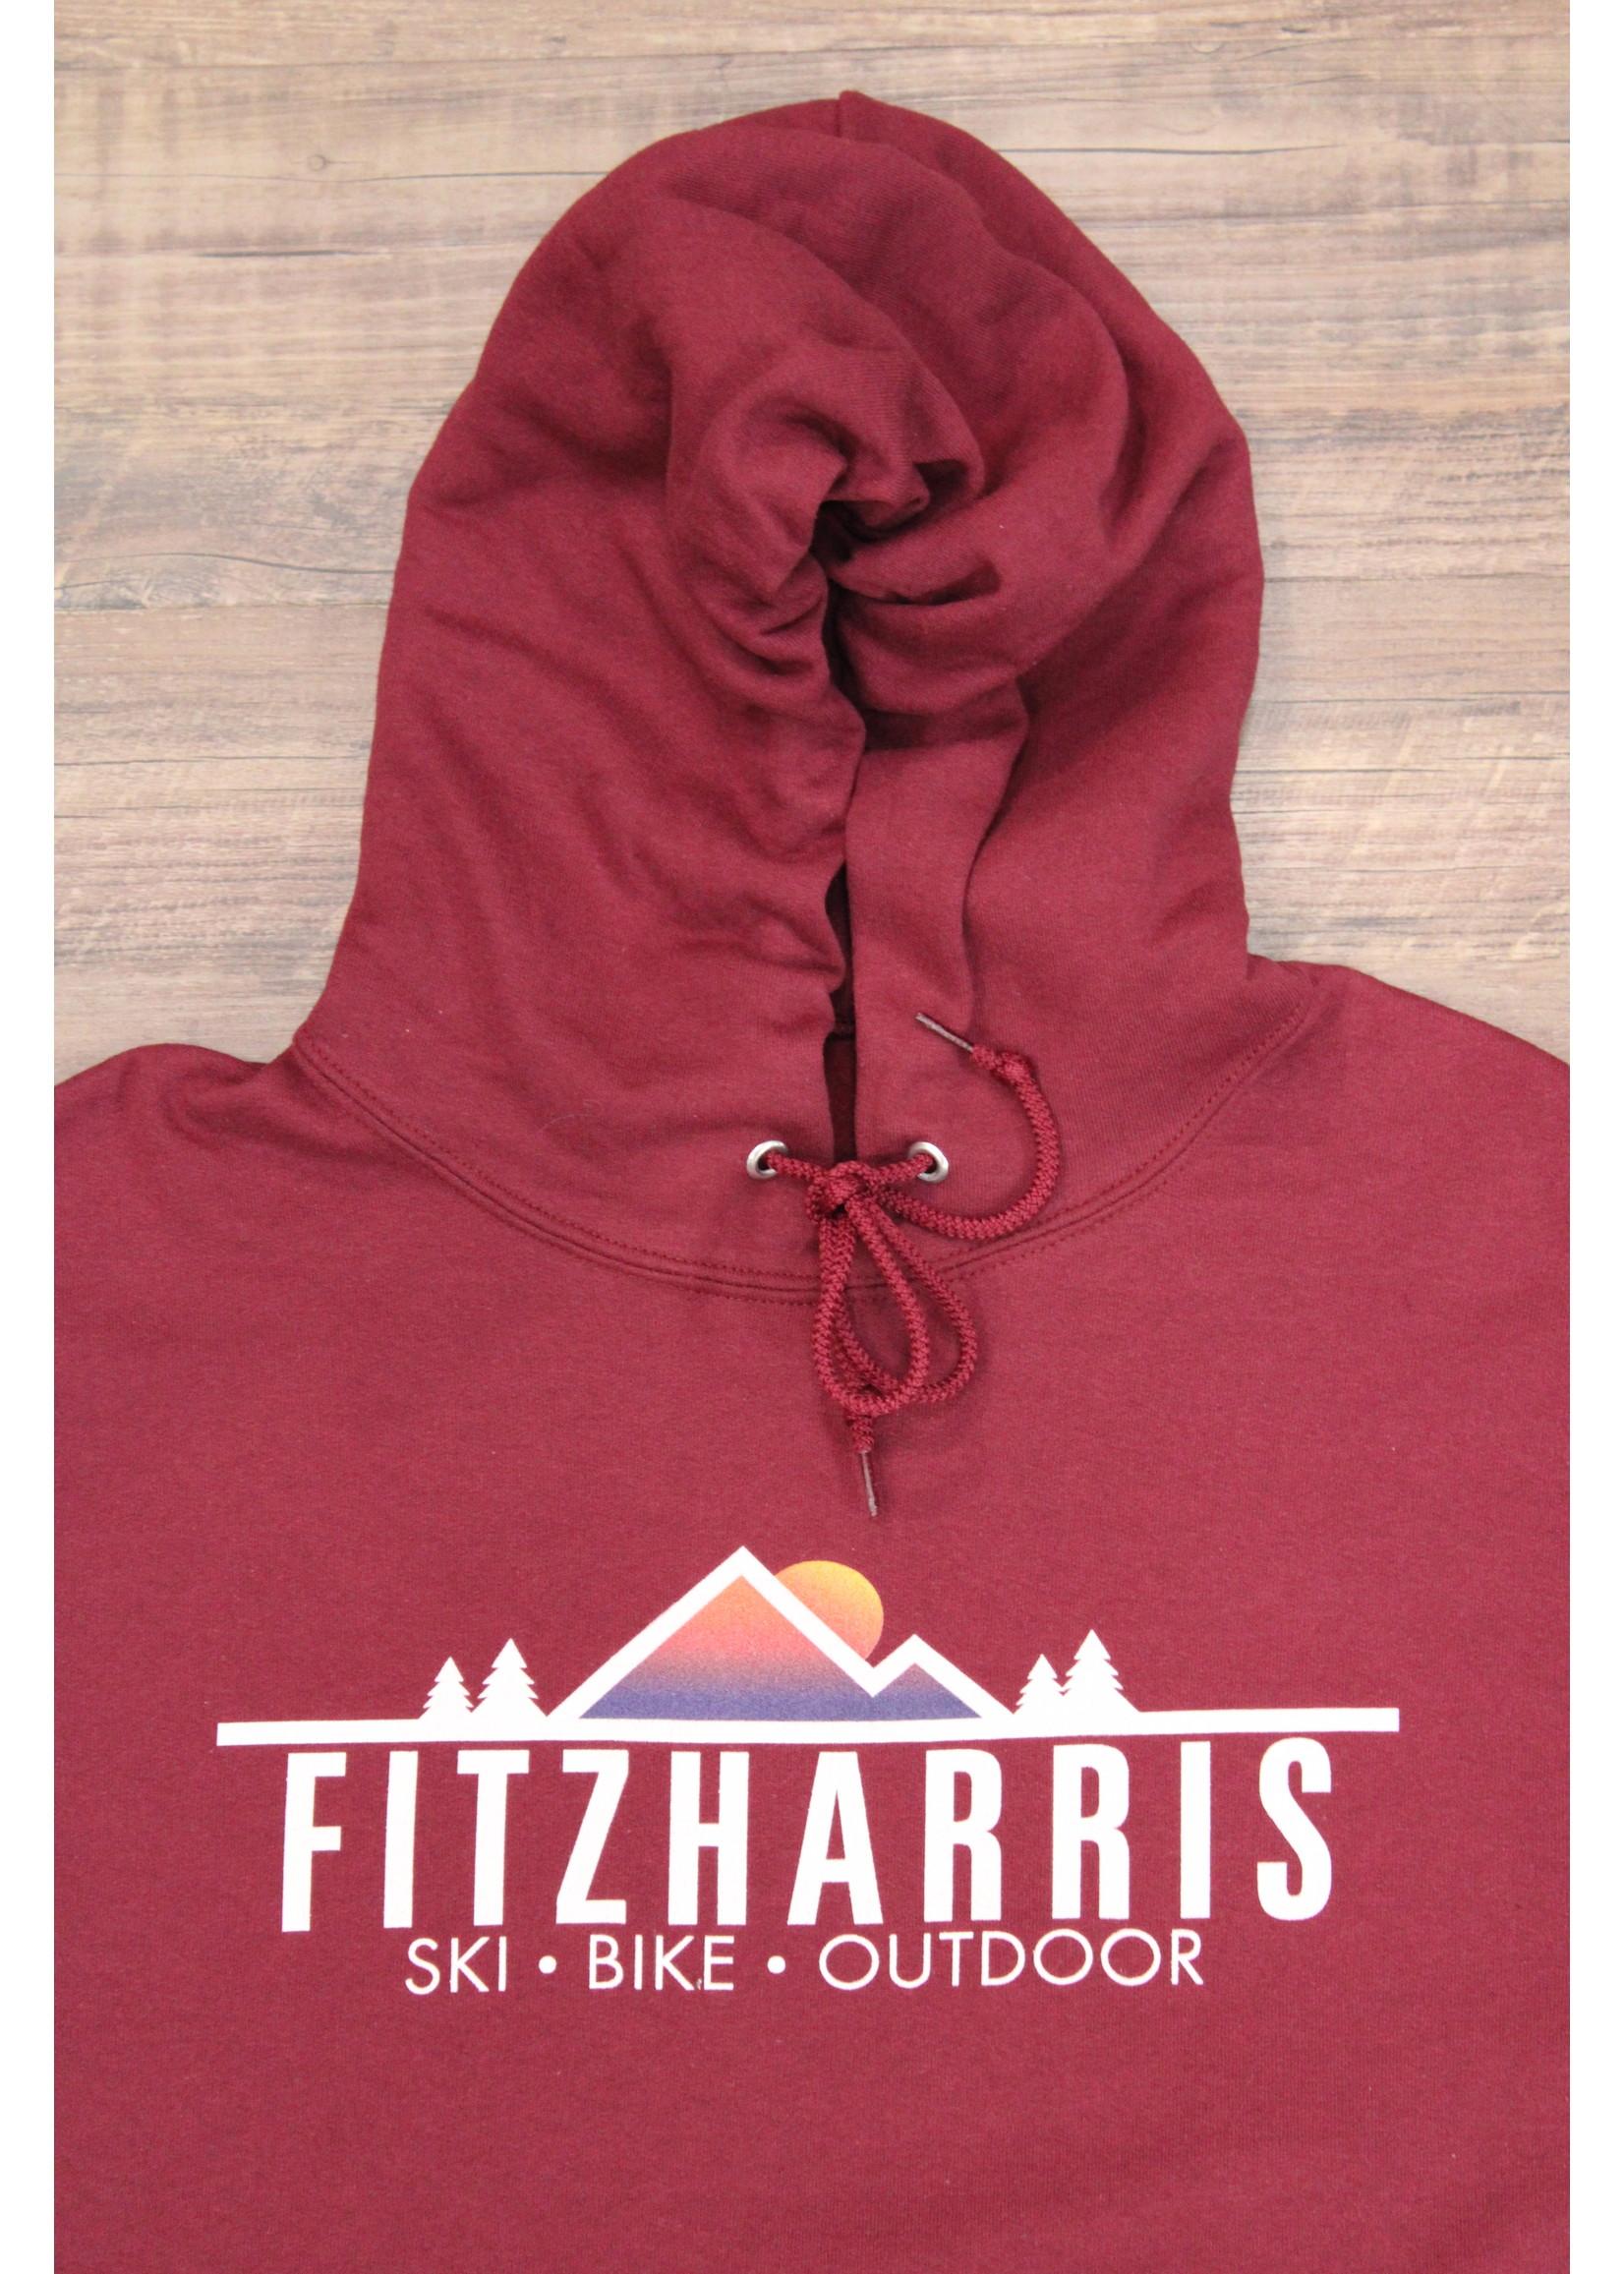 Fitzharris Fitz Logo Hooded Sweatshirt